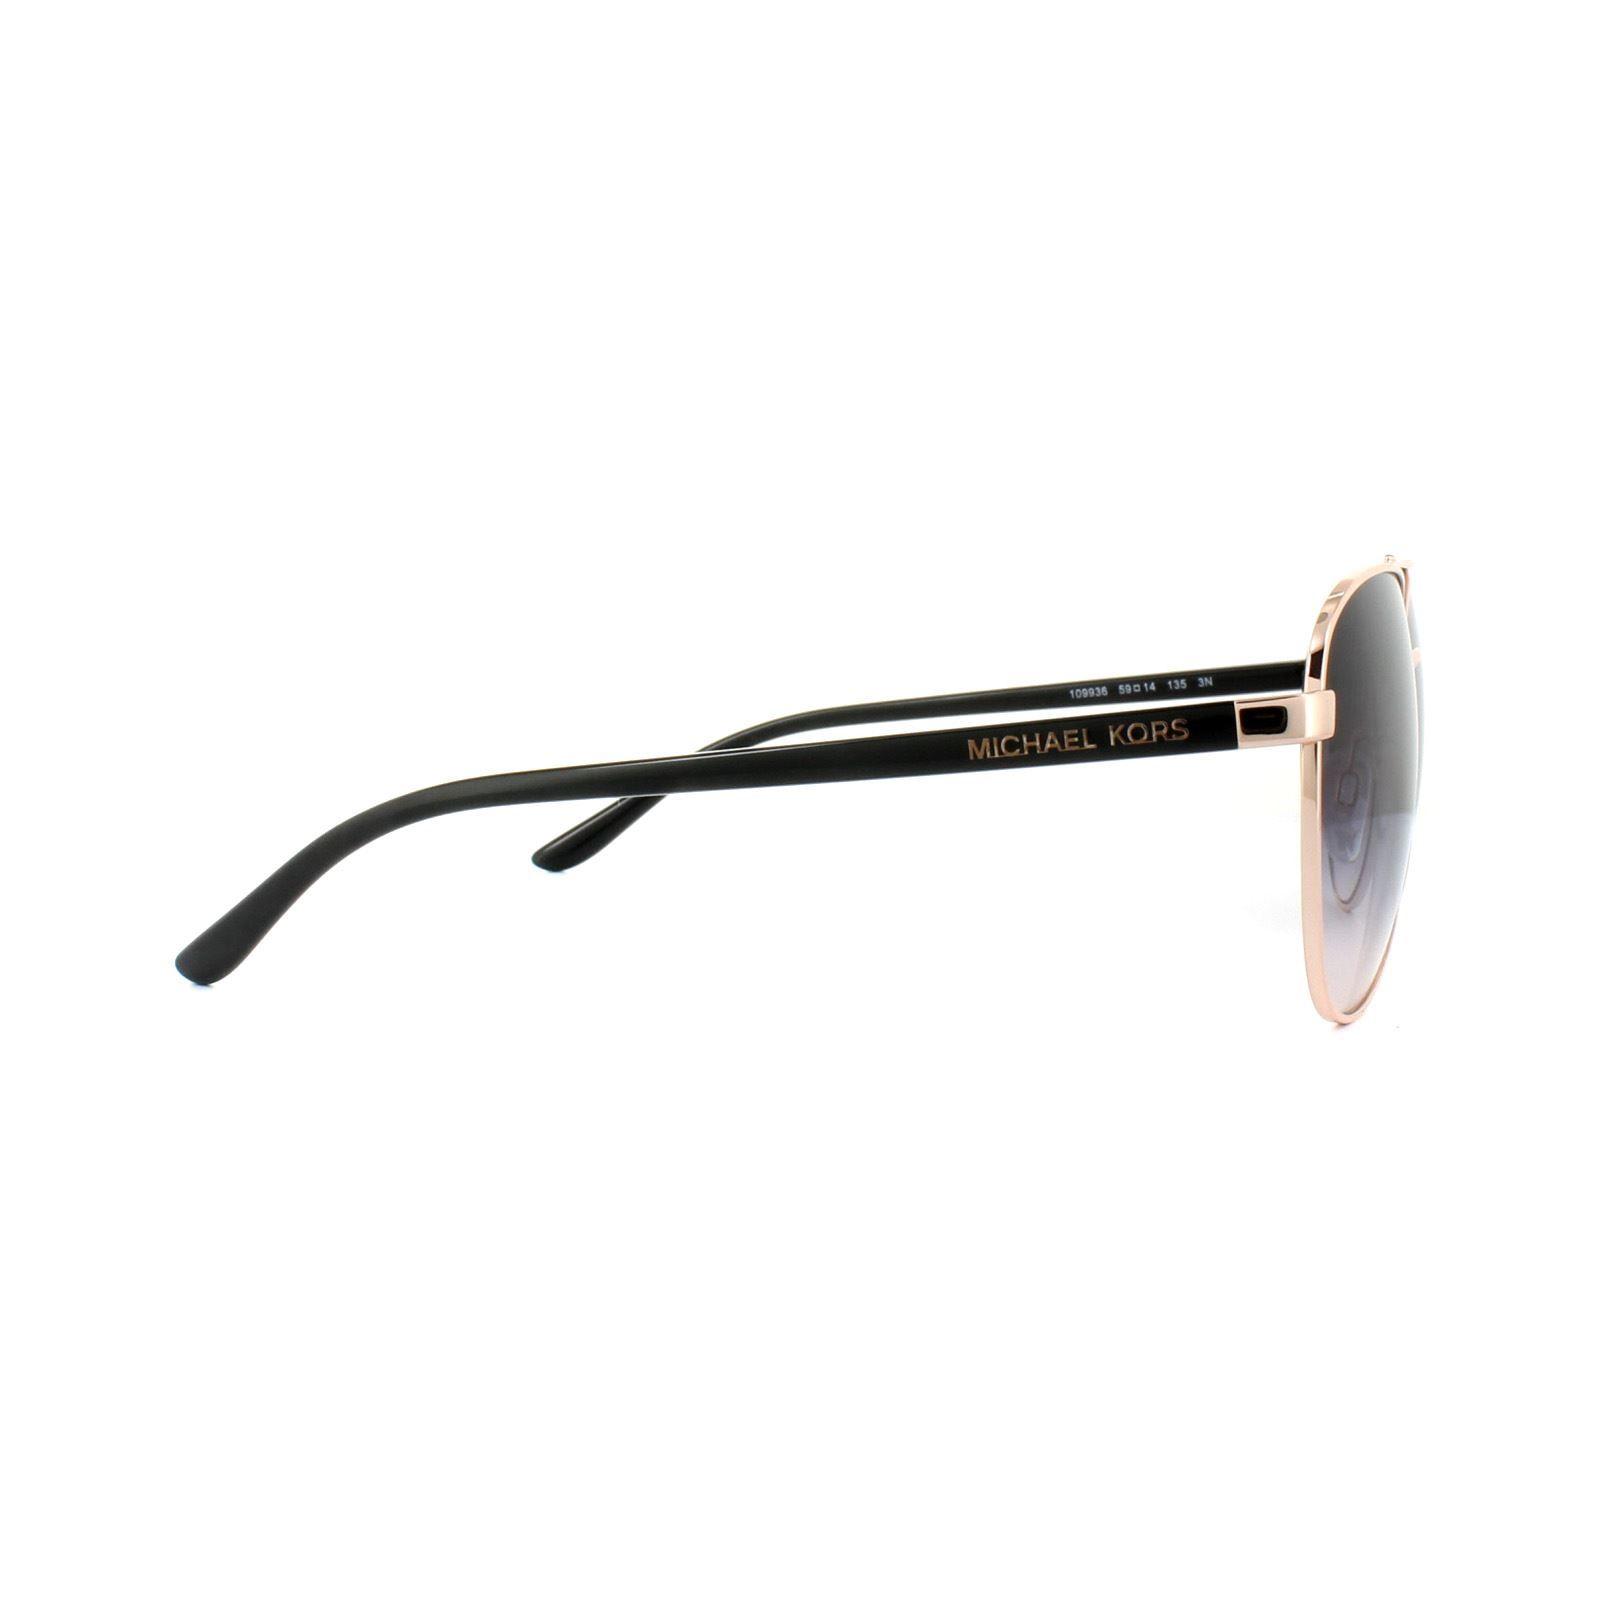 Michael Kors Sunglasses Hvar 5007 109936 Rose Gold Brown Gradient